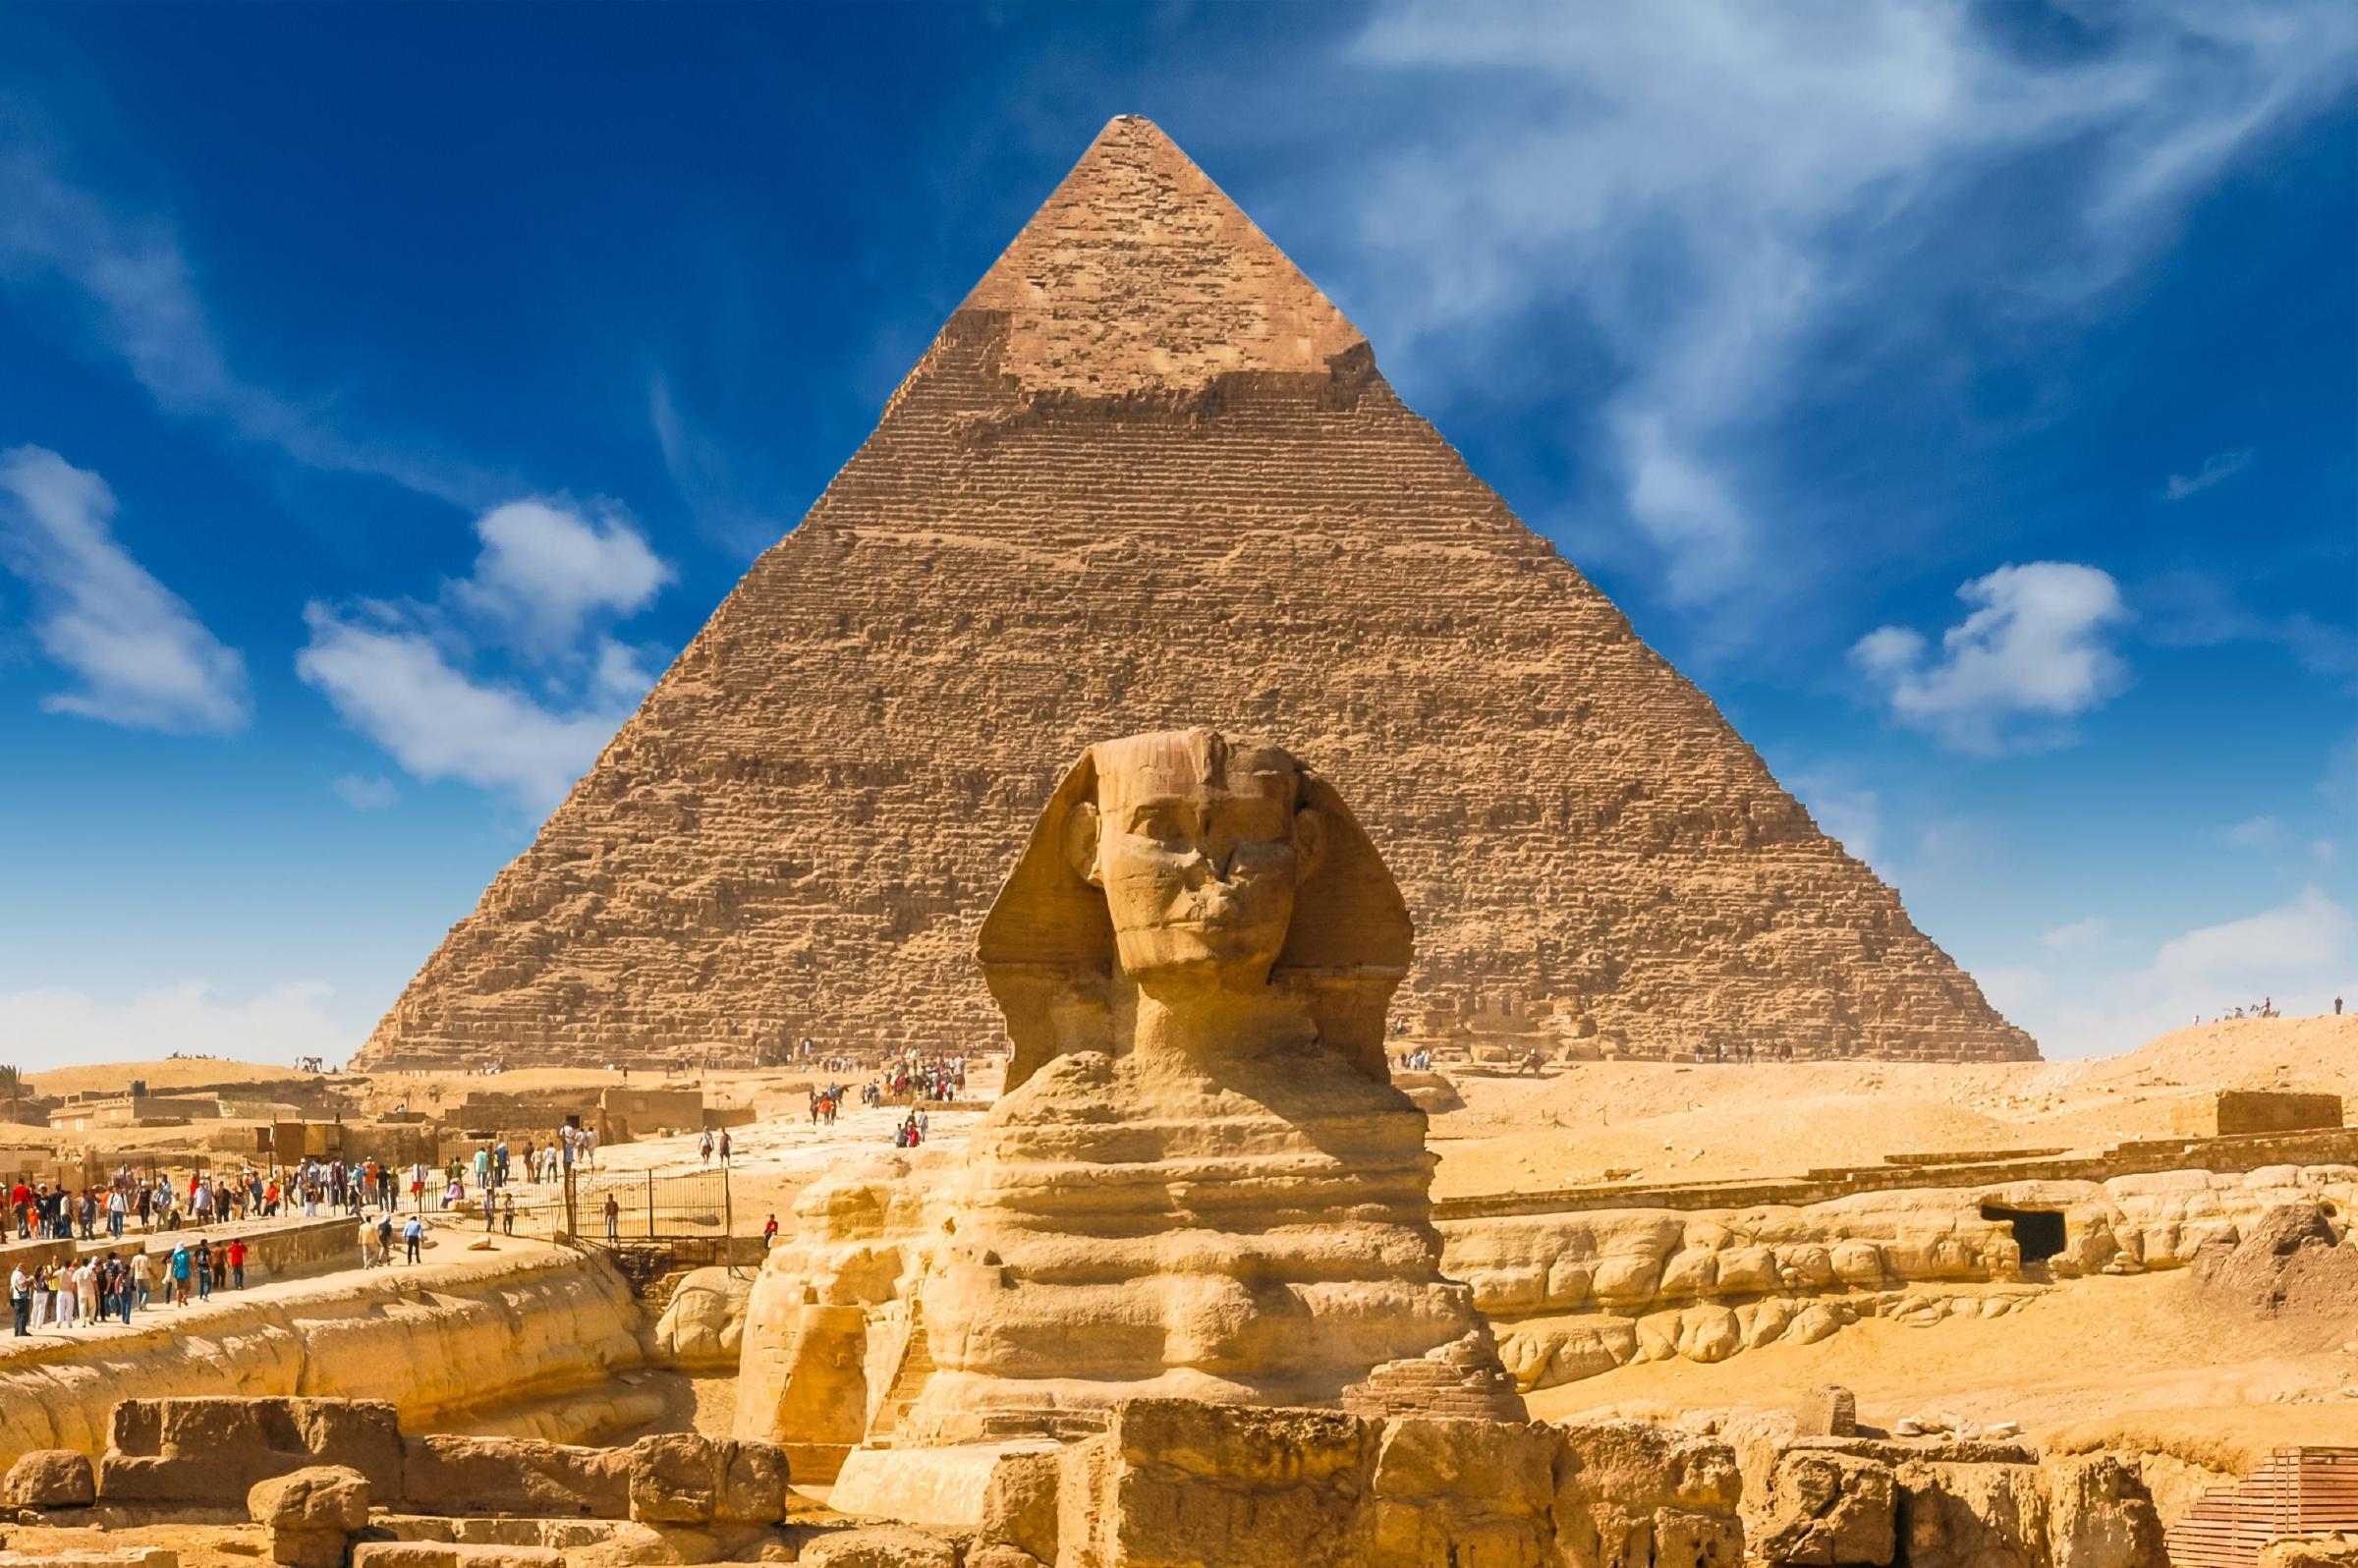 sphinx pyramids egypt